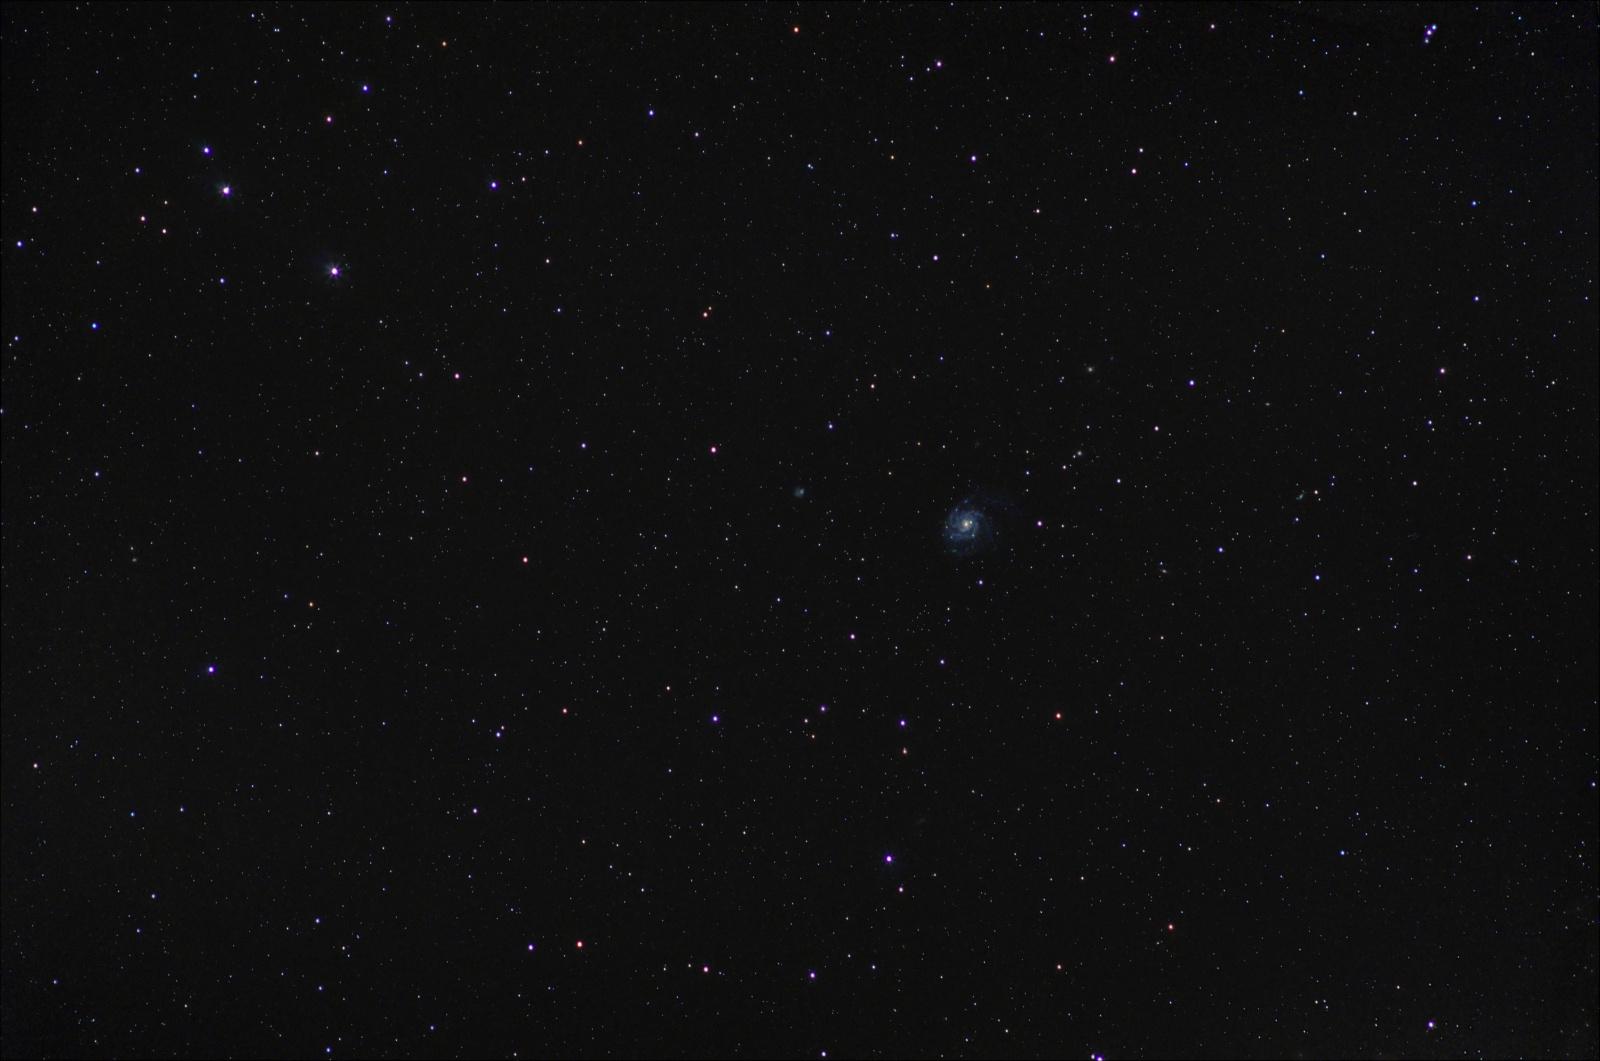 M101-pelny.thumb.jpg.67bb68ed3f9ce9a5c78bf3049a0ef955.jpg